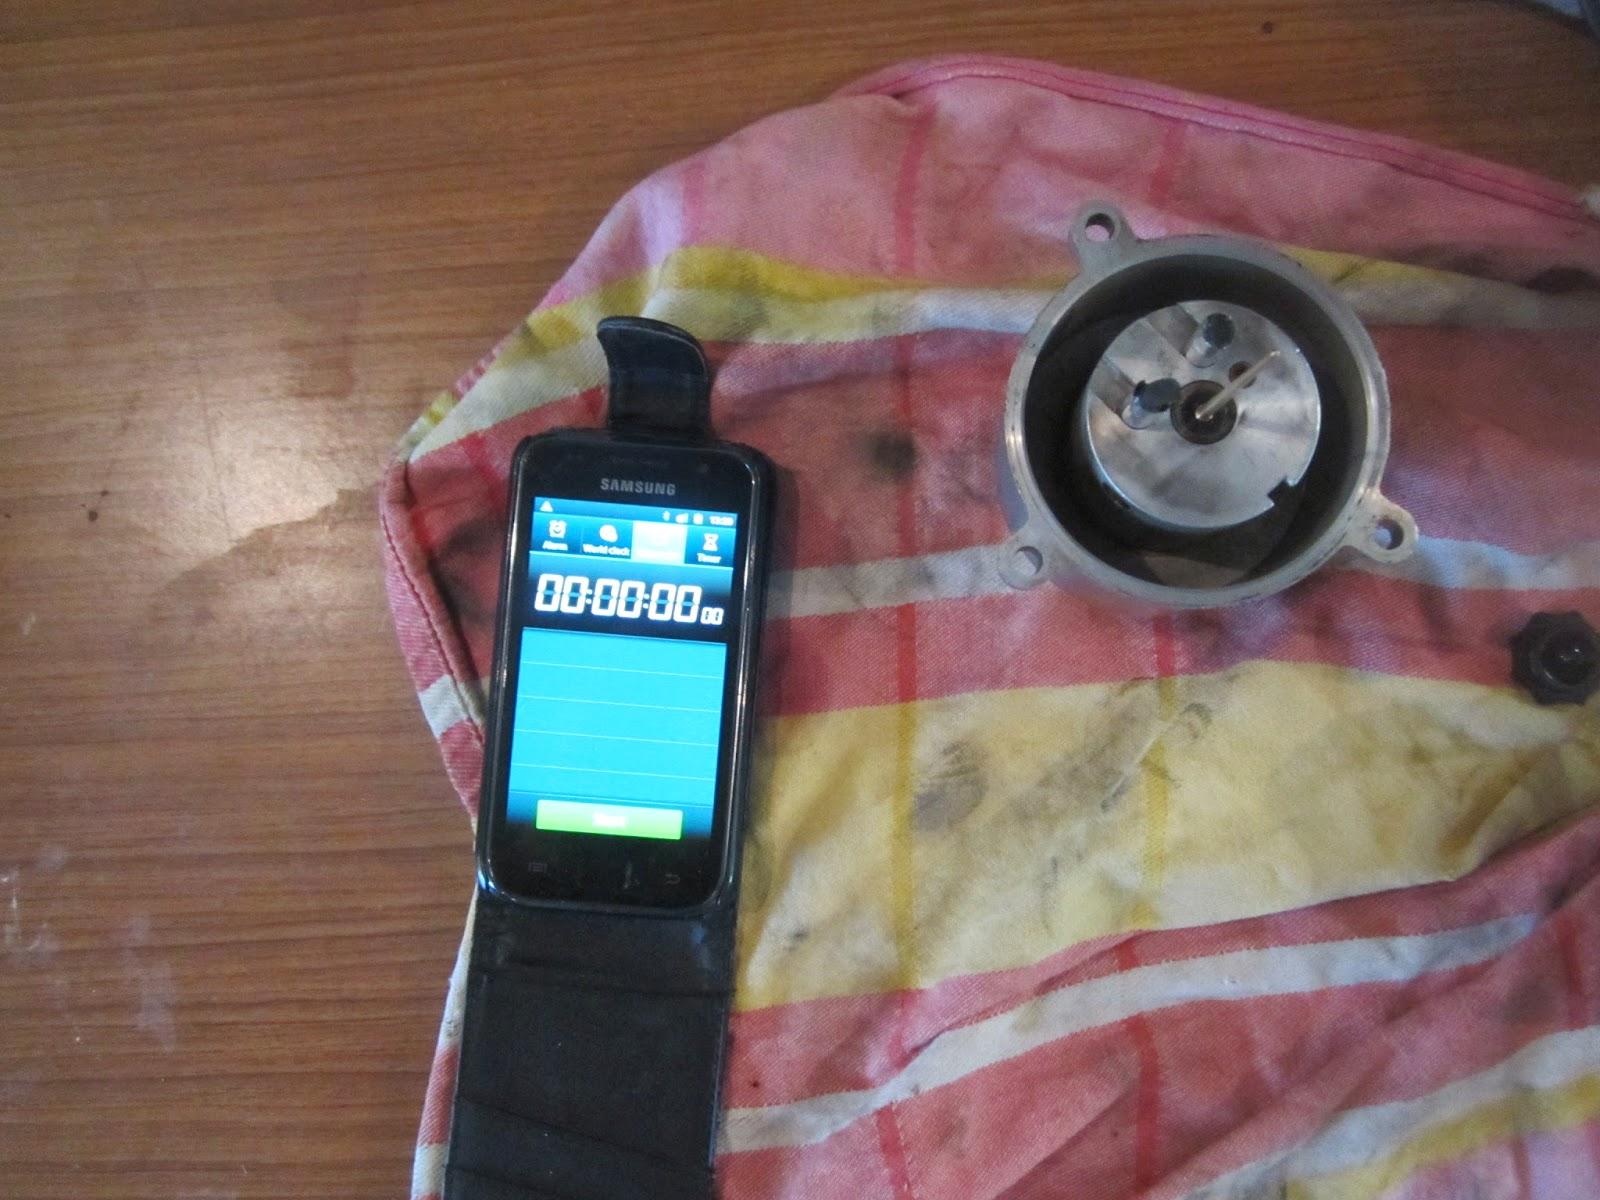 Measuring the SU HS6 carburetter piston drop time